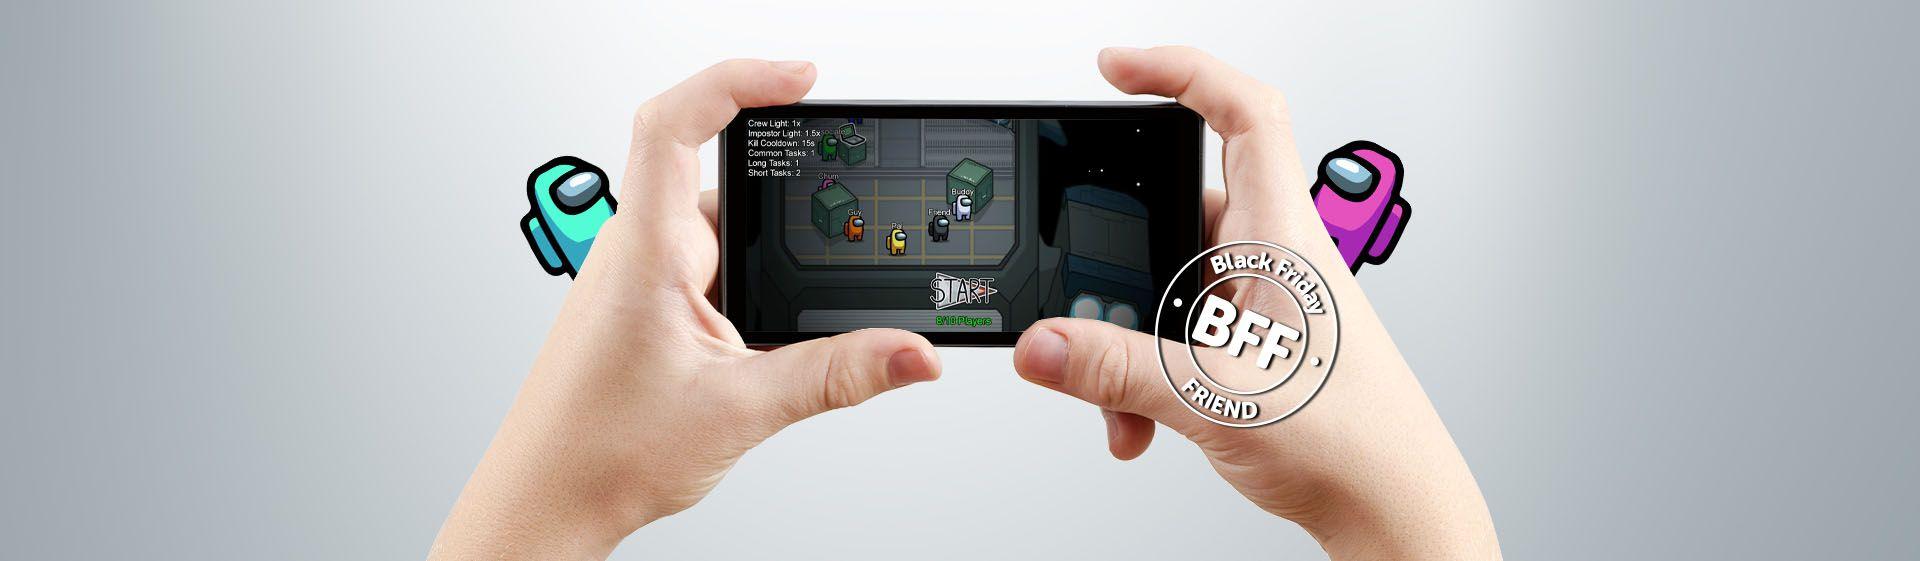 Celular para jogar Among Us: 5 modelos baratos que rodam o game